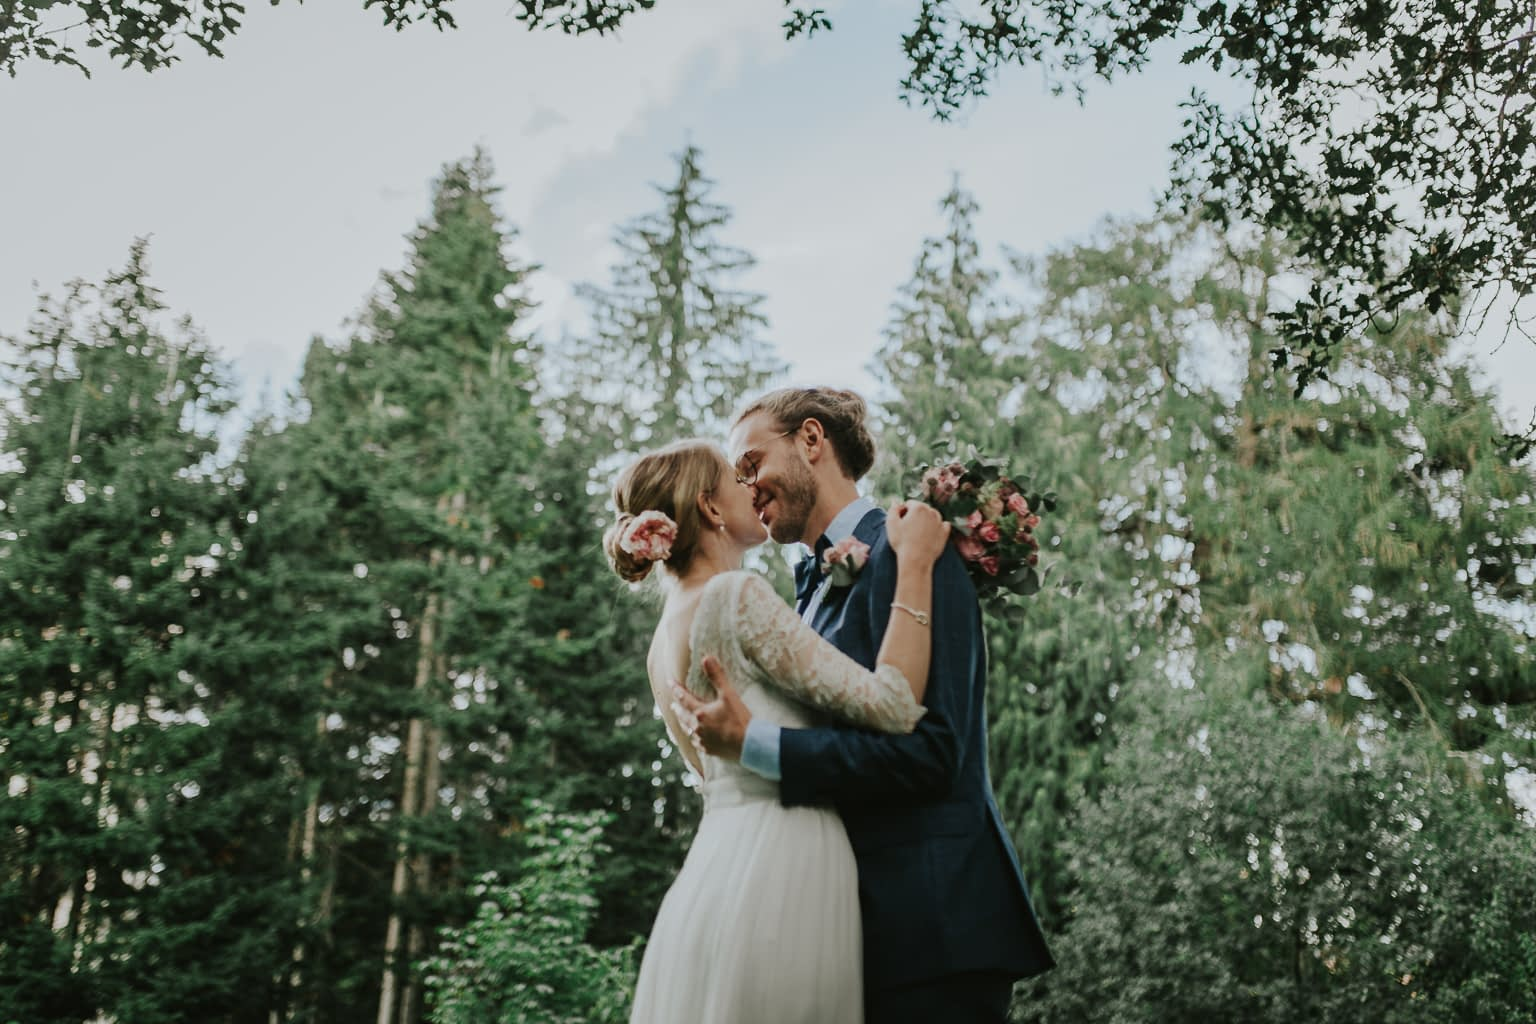 couple amoureux photo mariée